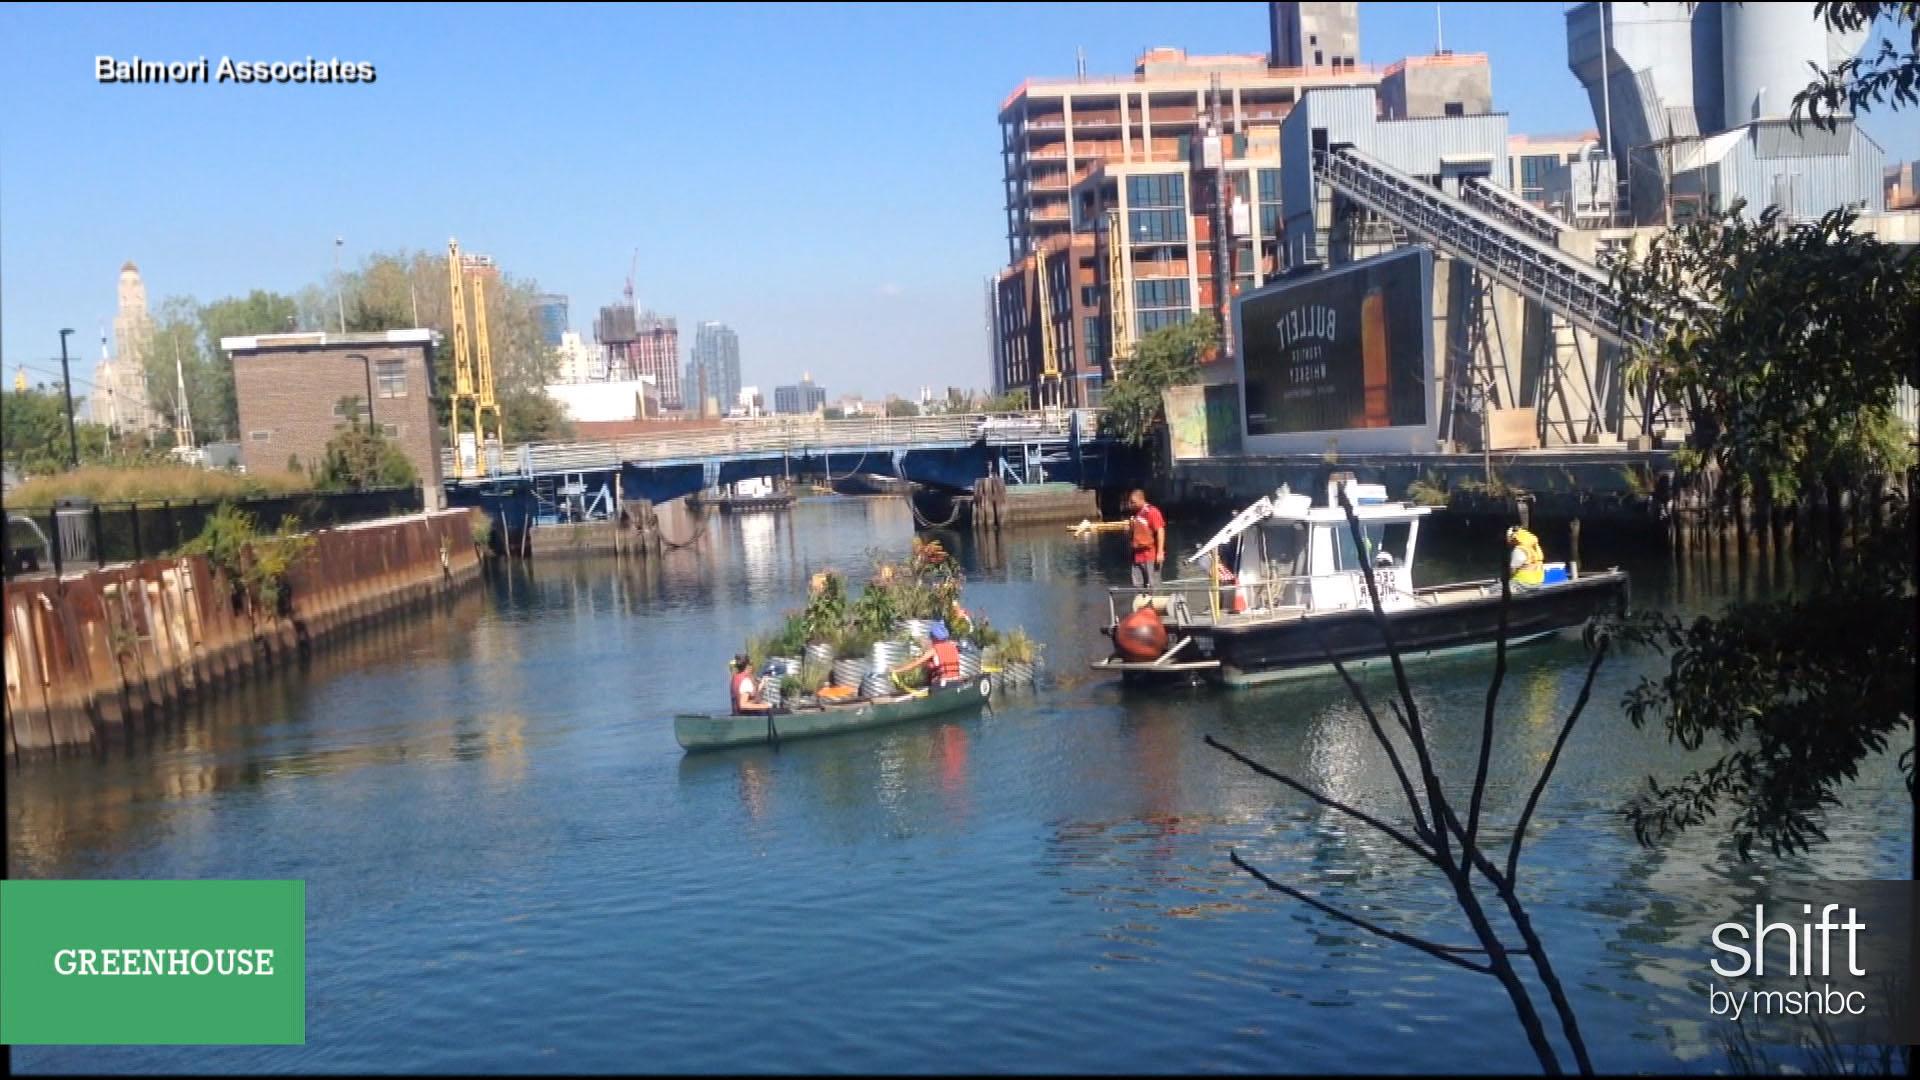 Floating garden will clean the Gowanus